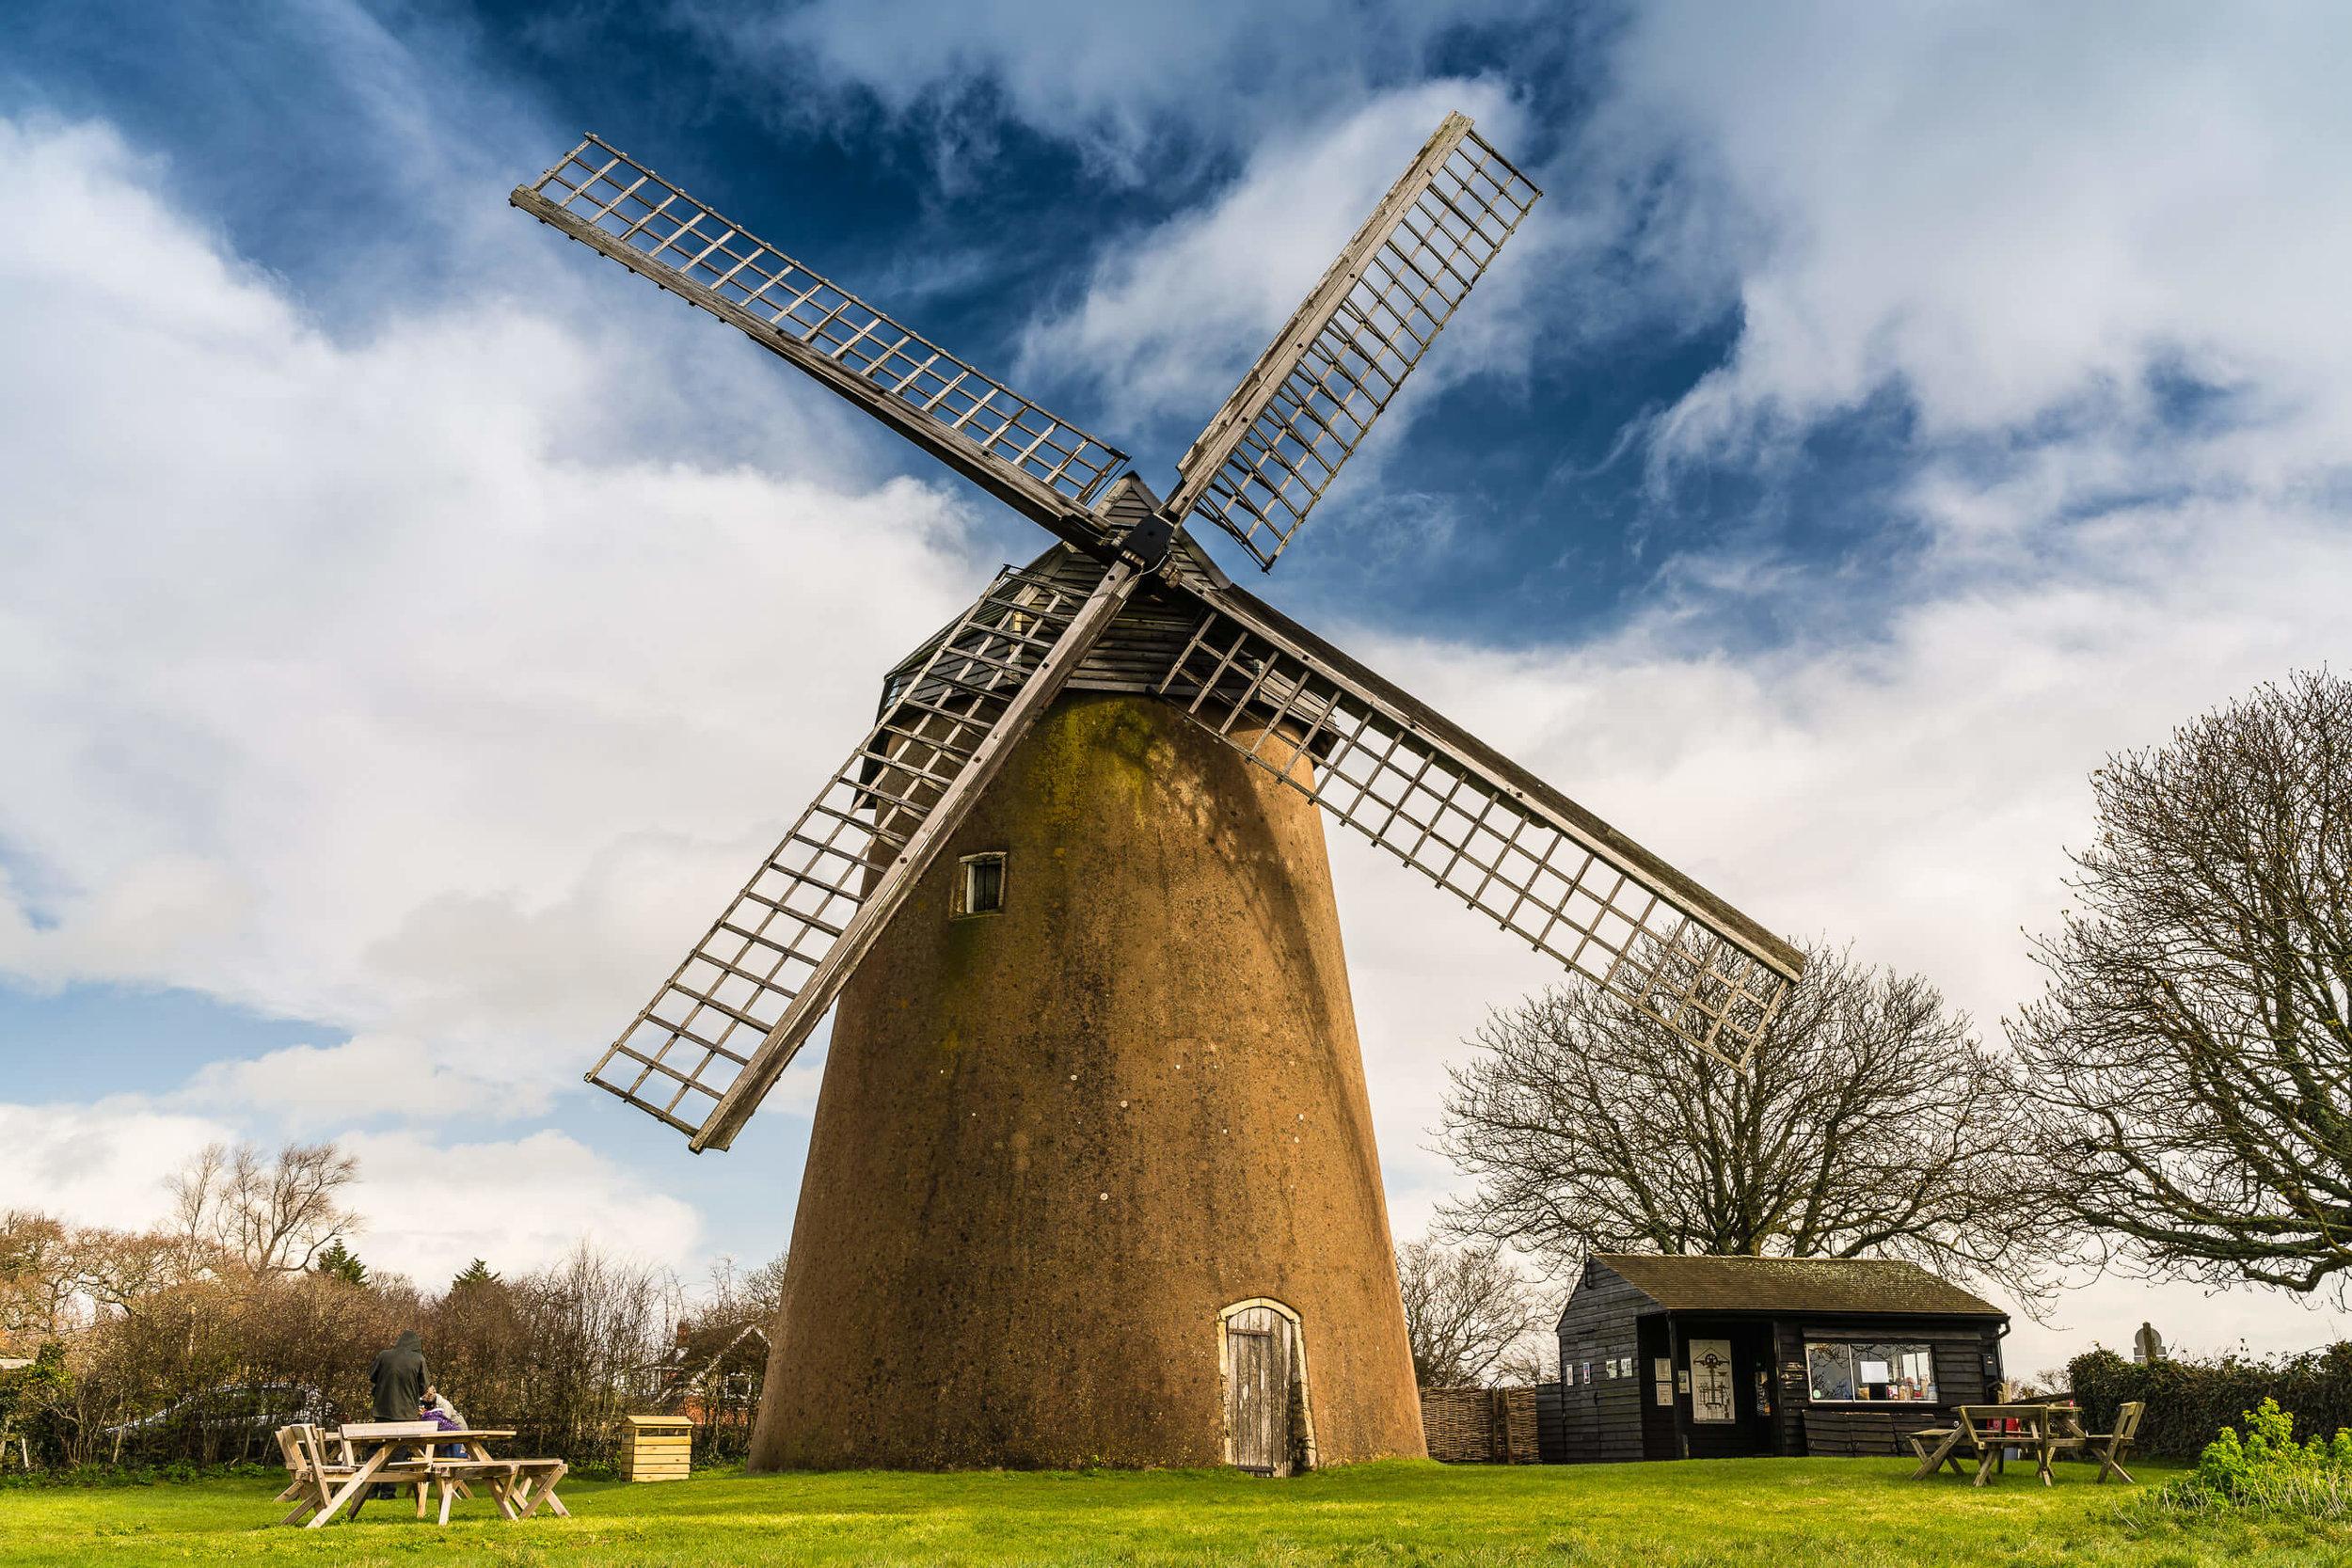 bembridge-windmill-isle-of-wight.jpg